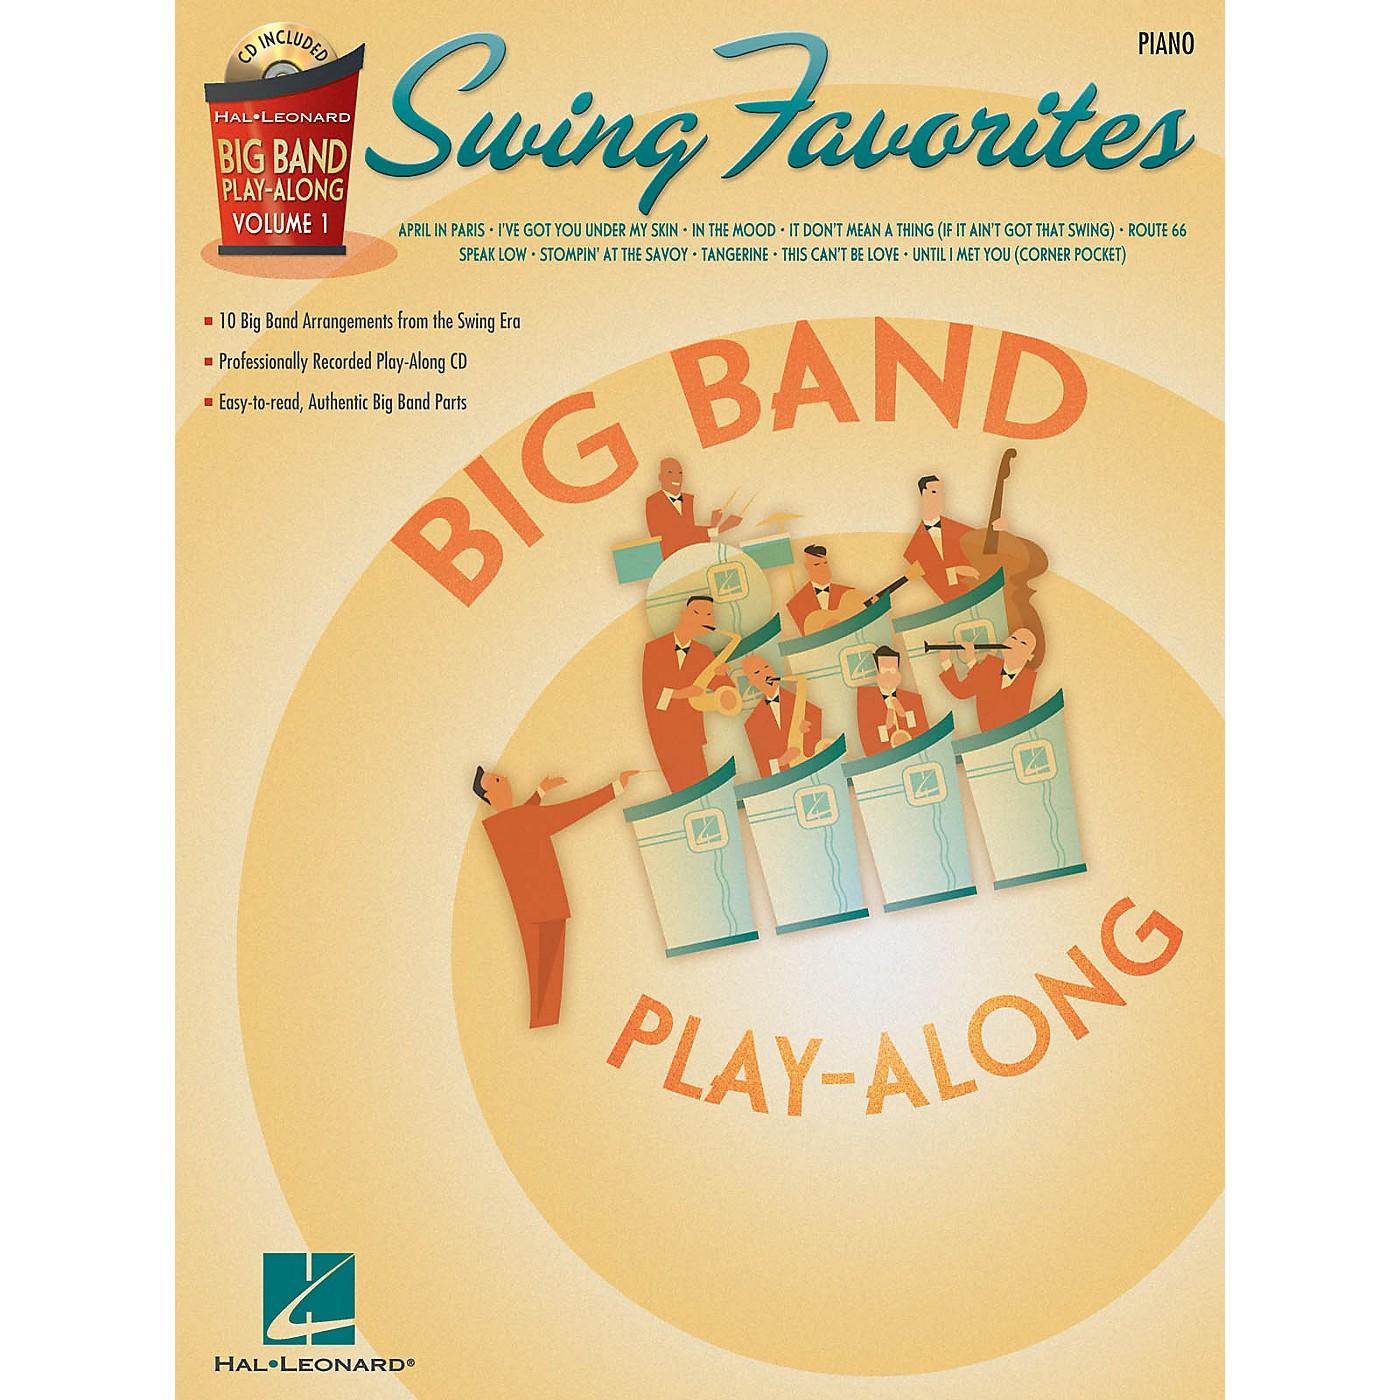 Hal Leonard Swing Favorites - Piano (Big Band Play-Along Volume 1) Big Band Play-Along Series Softcover with CD thumbnail